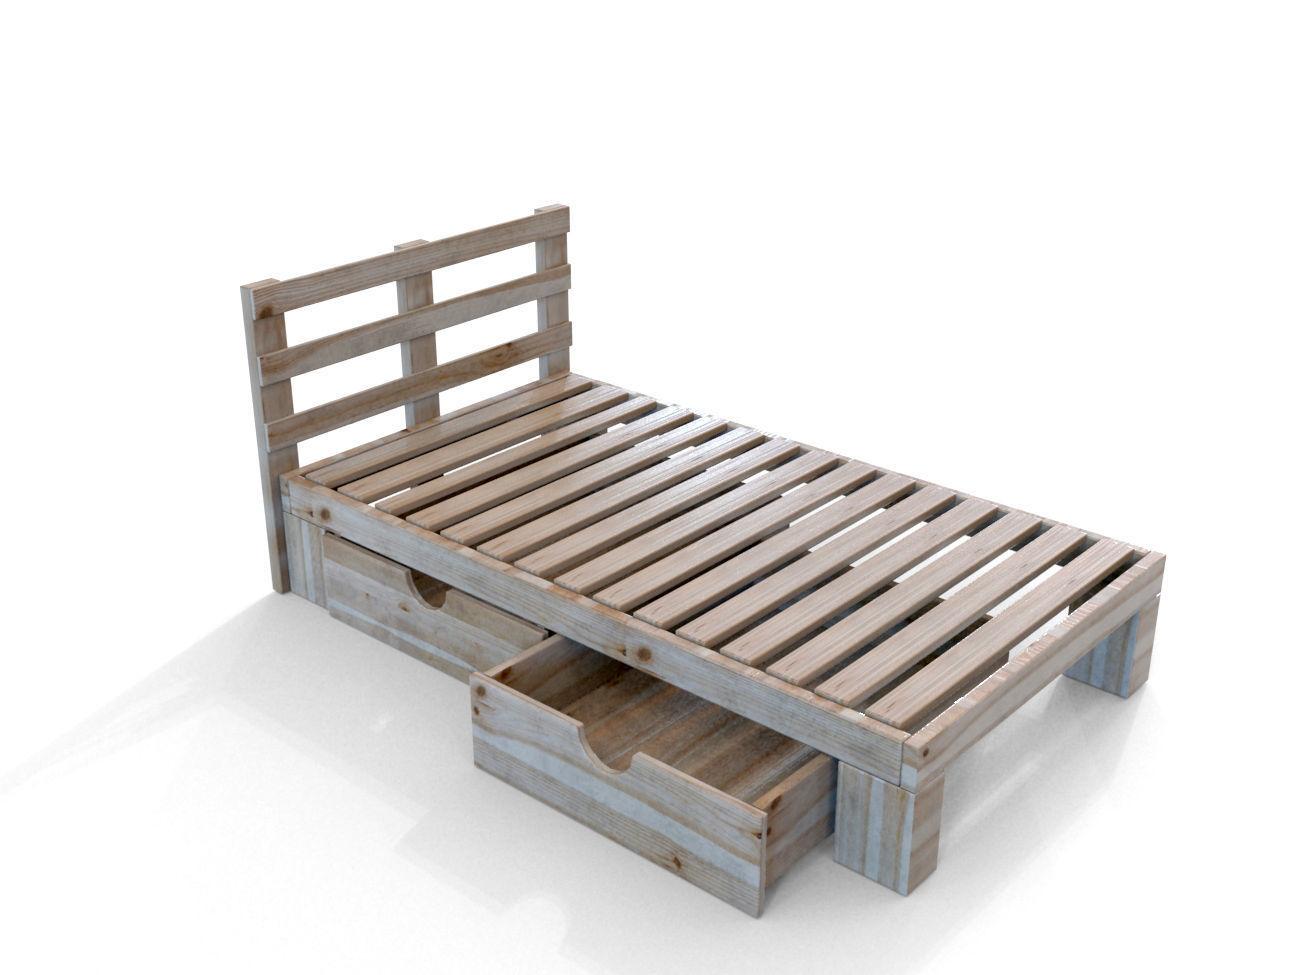 ... Simple Wooden Bed 3d Model Max Obj 3ds Fbx Mtl Unitypackage 2 ...